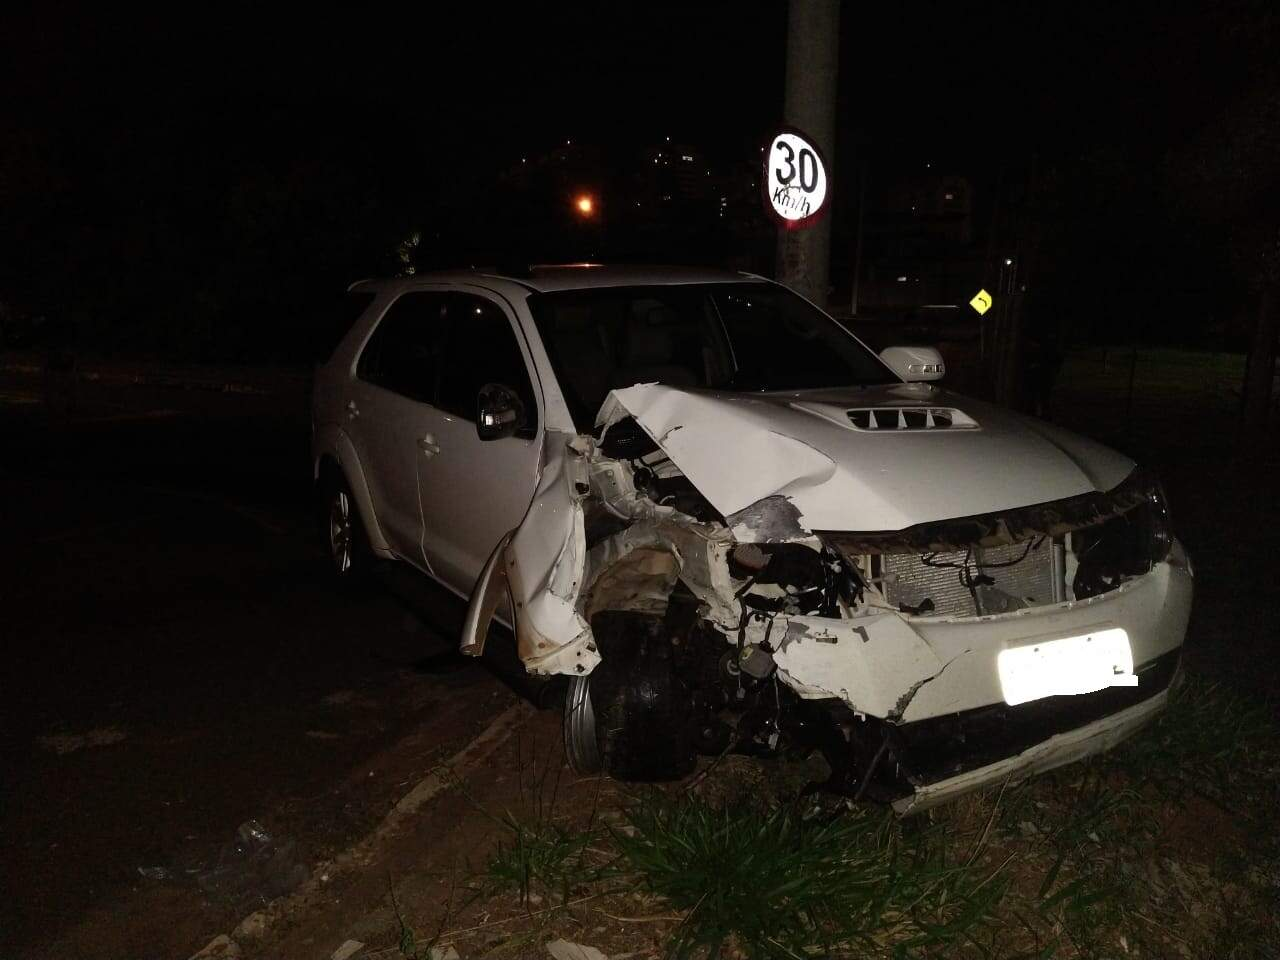 A parte frontal do veículo ficou parcialmente destruída. (Foto: Suzana Servian)